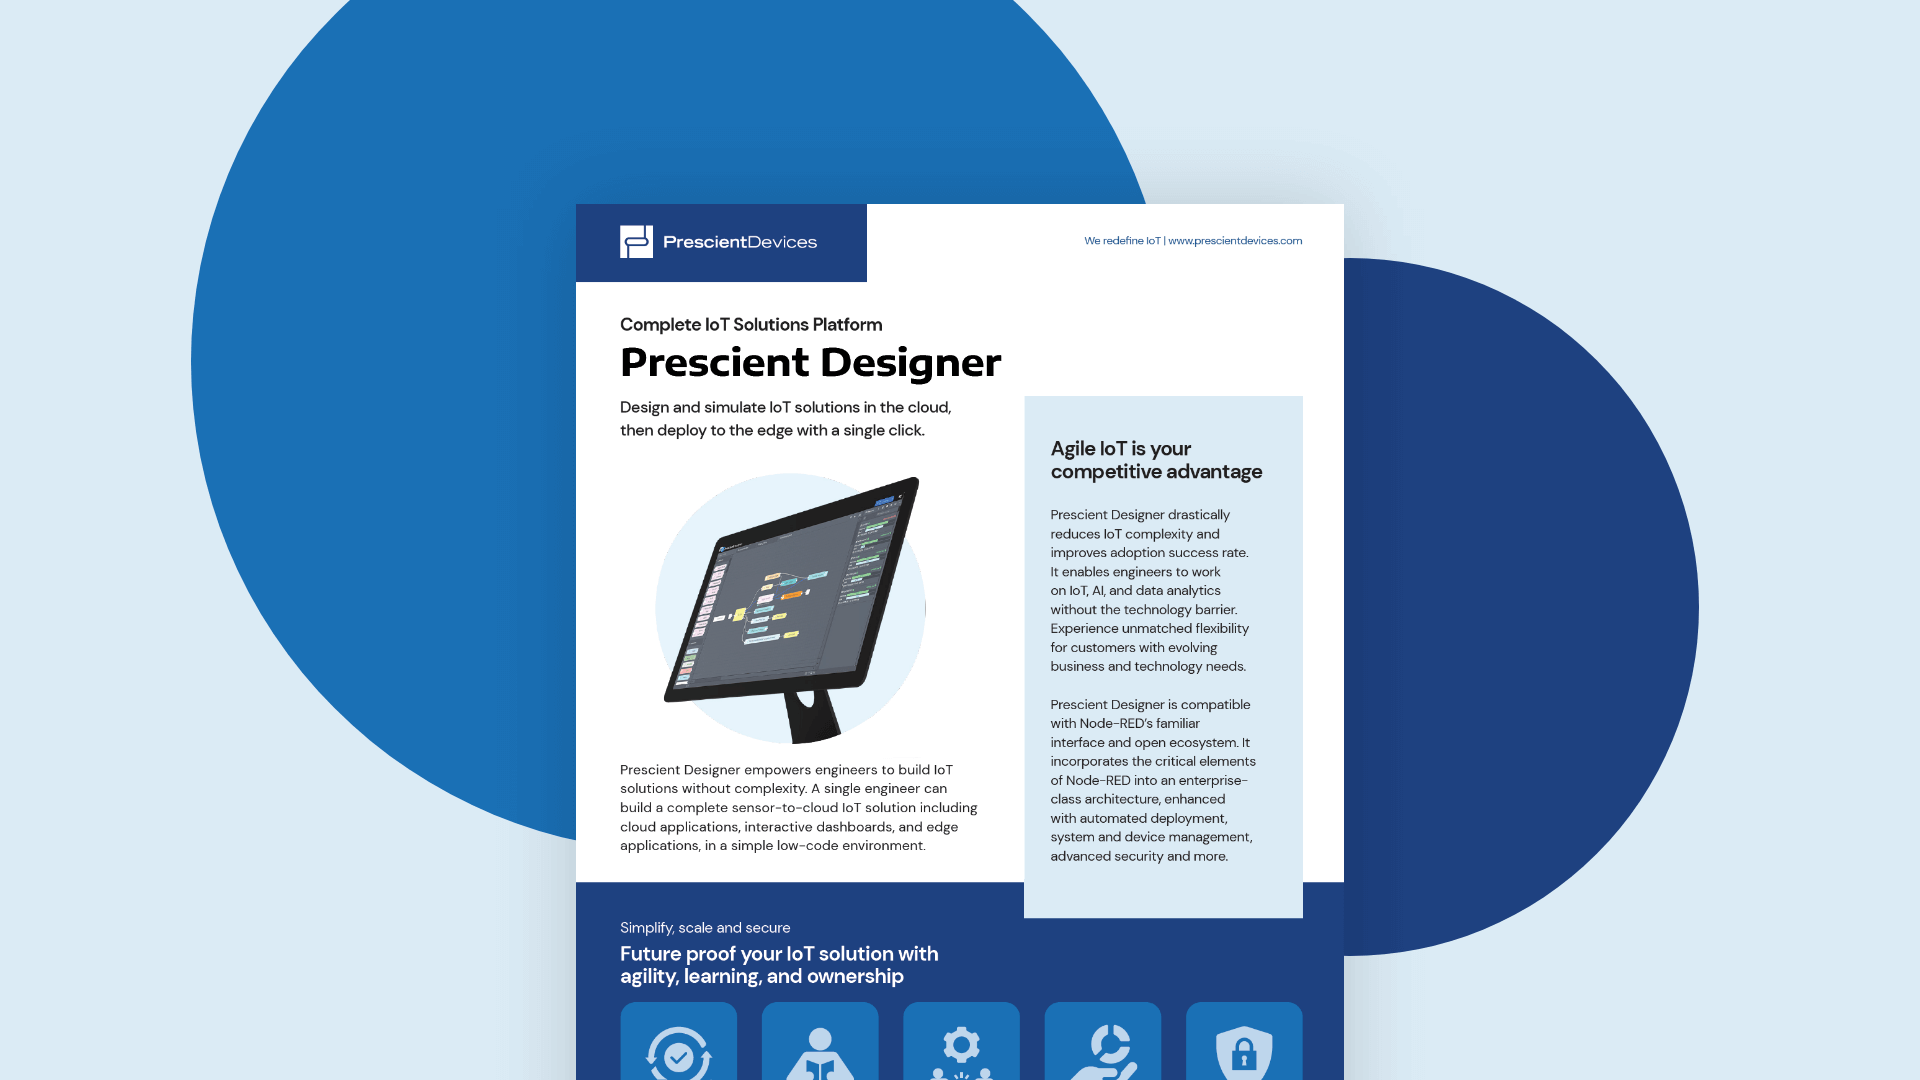 Download the Prescient Designer IoT datasheet